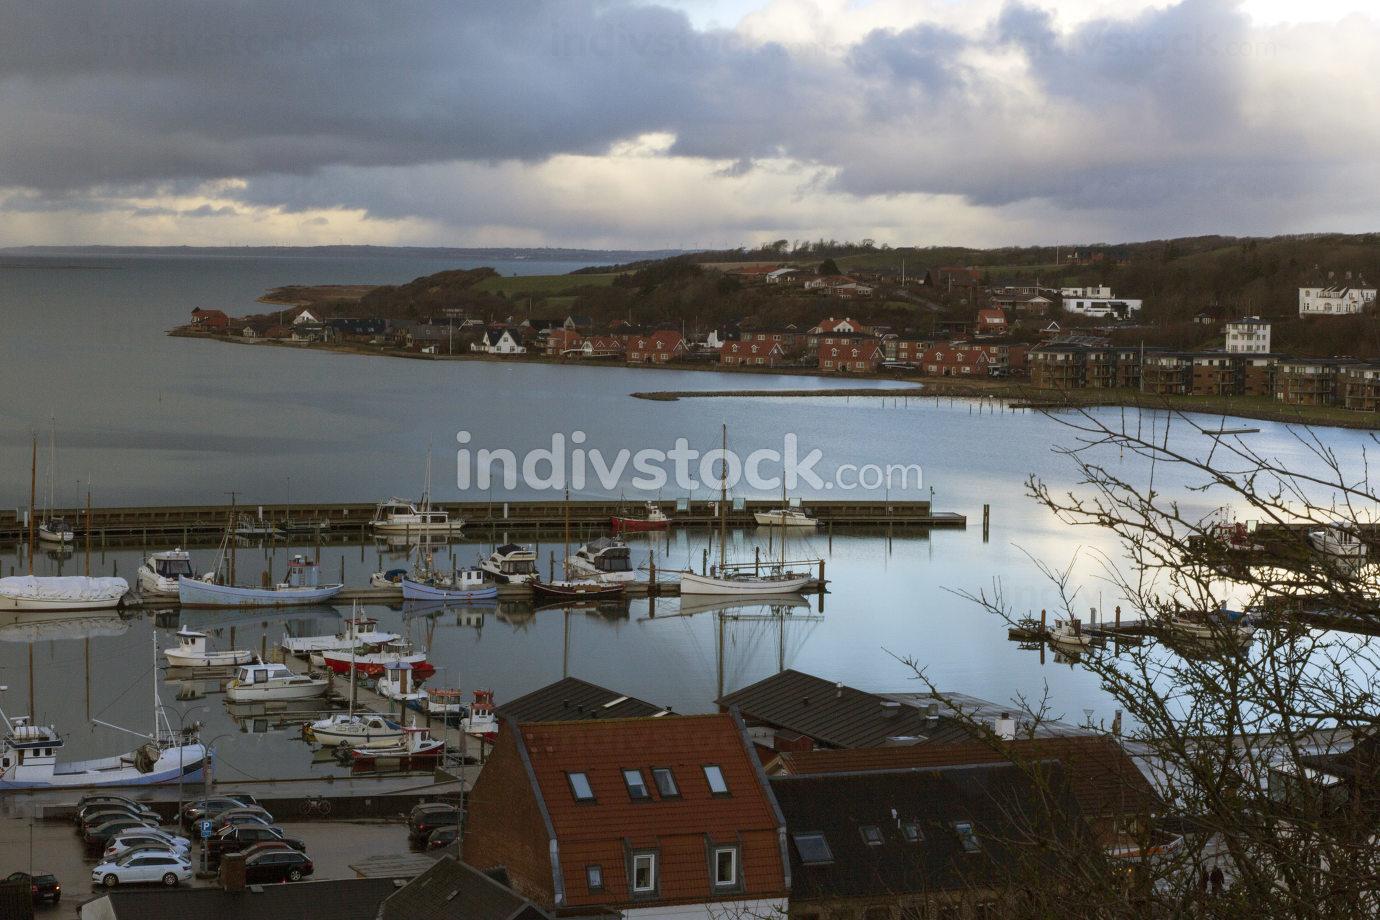 Morning view of the harbour of Lemvig, Denmark